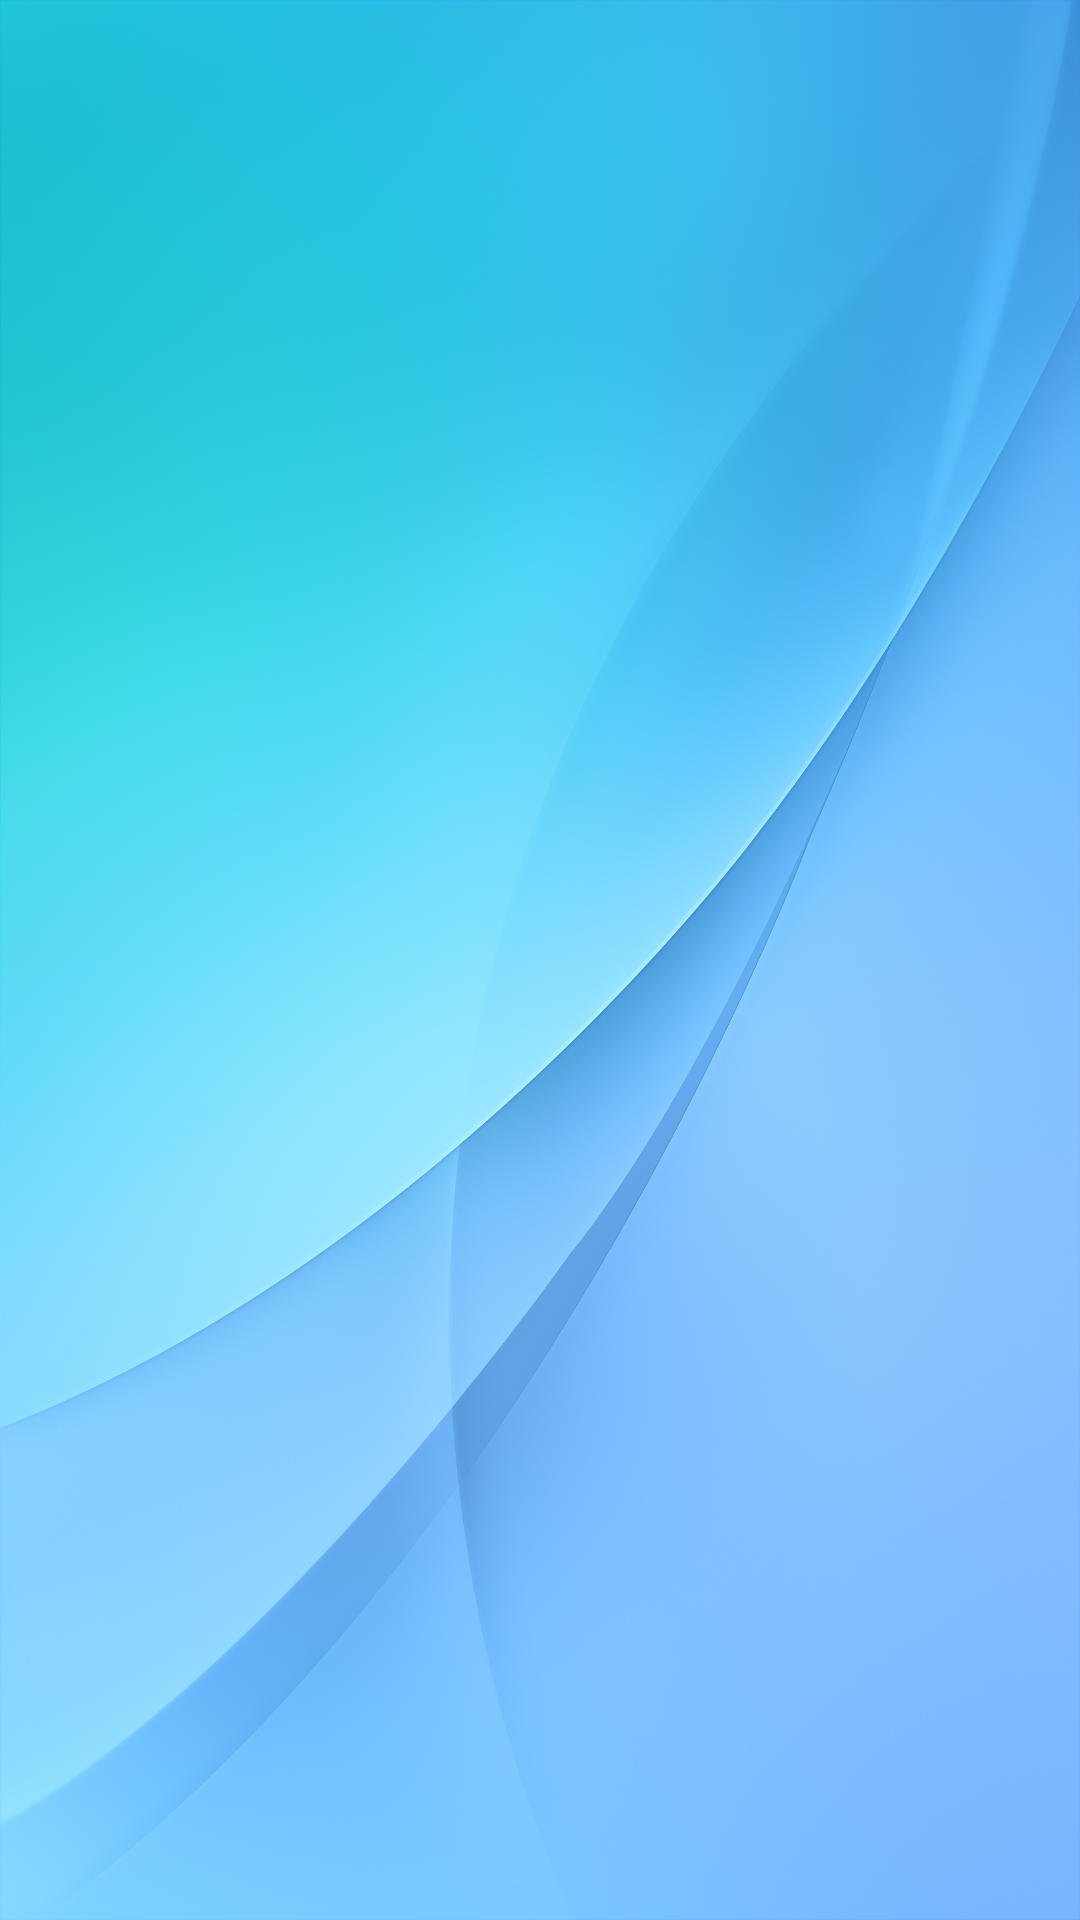 1 Wallpaper Wallpapers For Xiaomi Redmi 4x 4a Prime